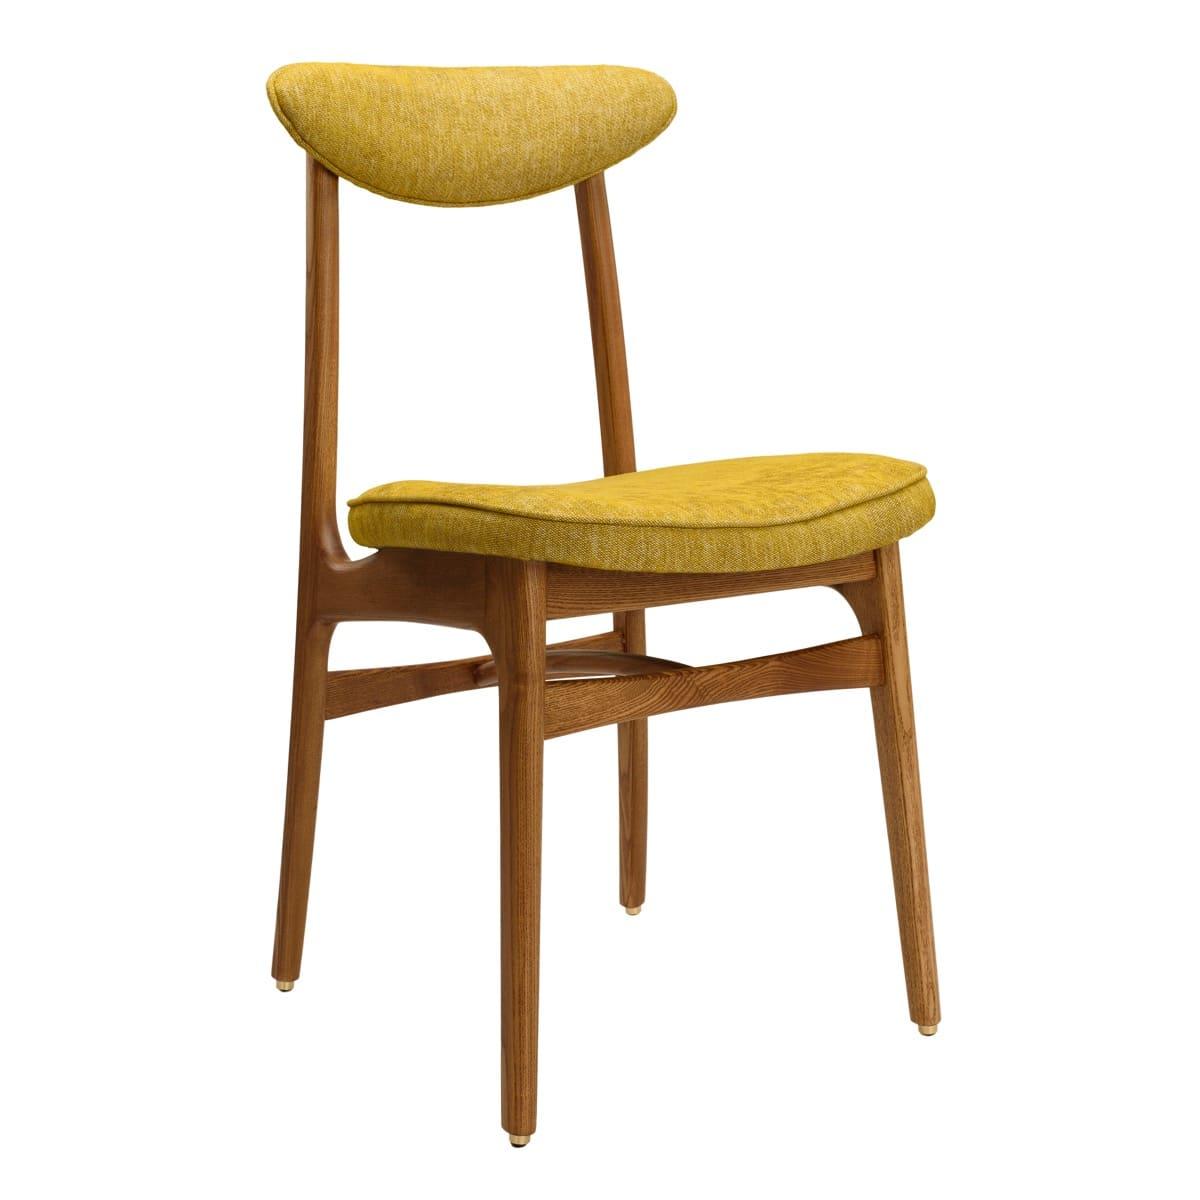 200 190 Chair Loft Mustard3